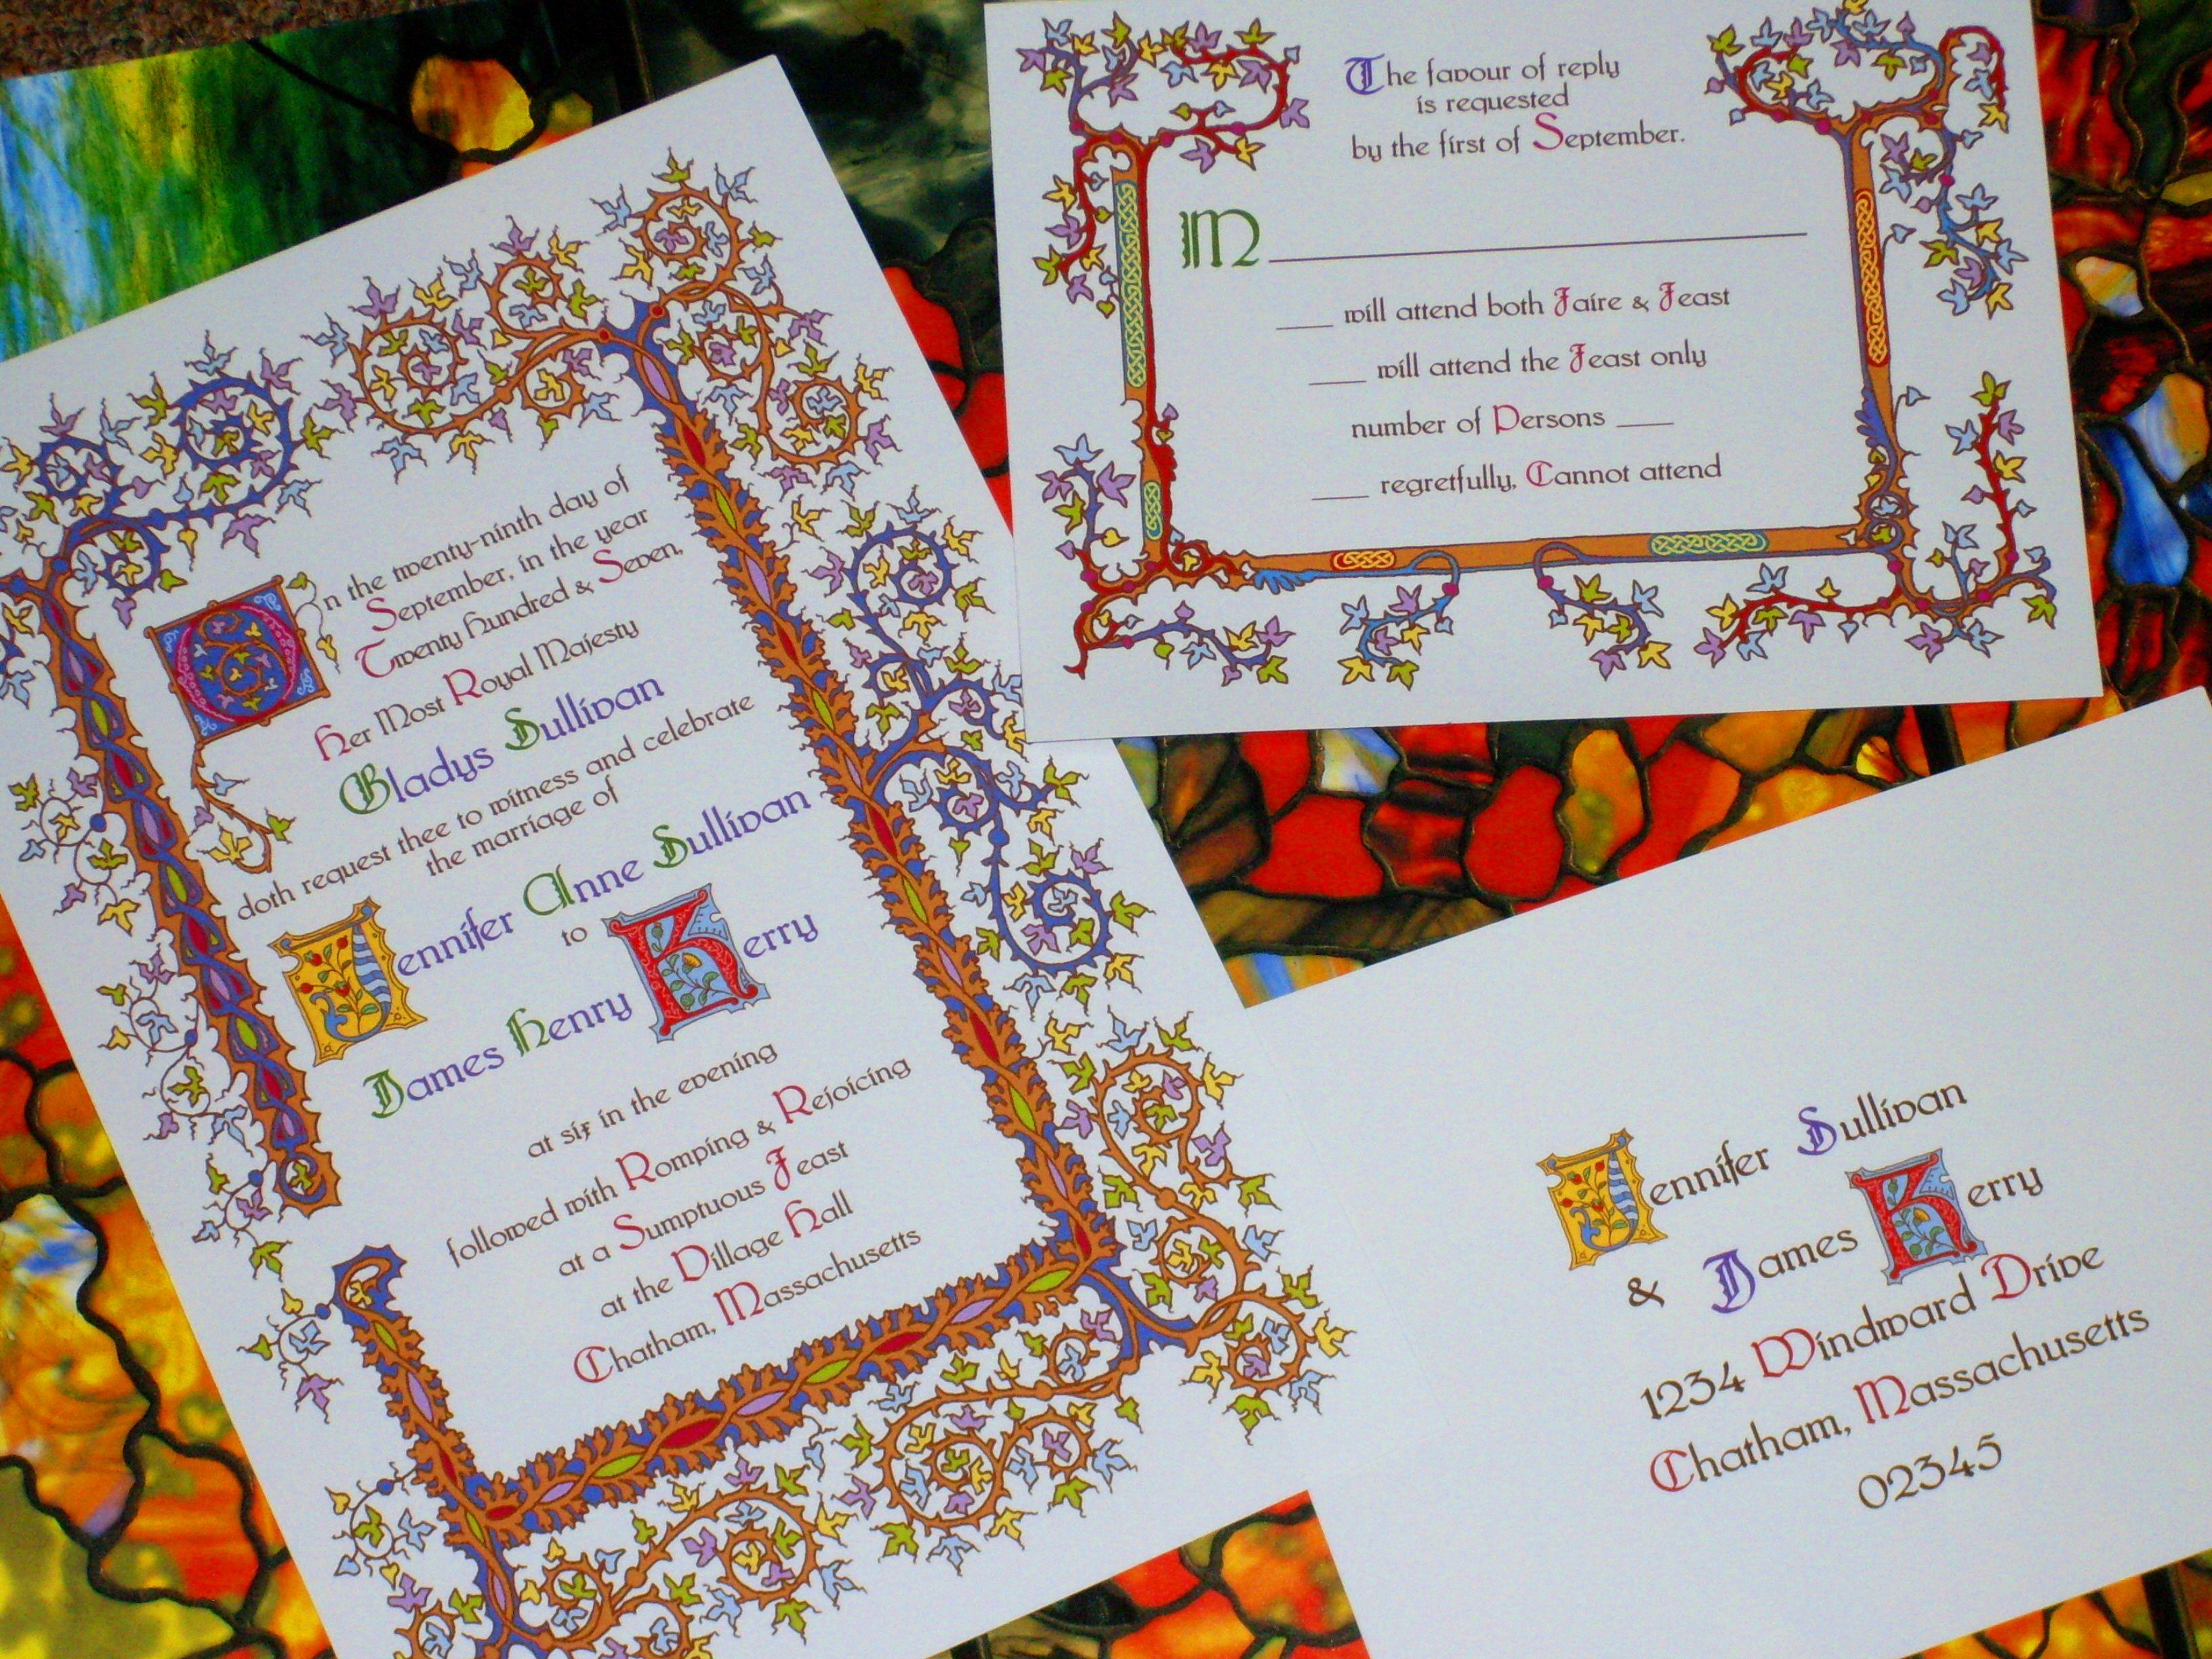 custom wedding invitations for theme weddings renaissance weddings medieval weddings - Medieval Wedding Invitations